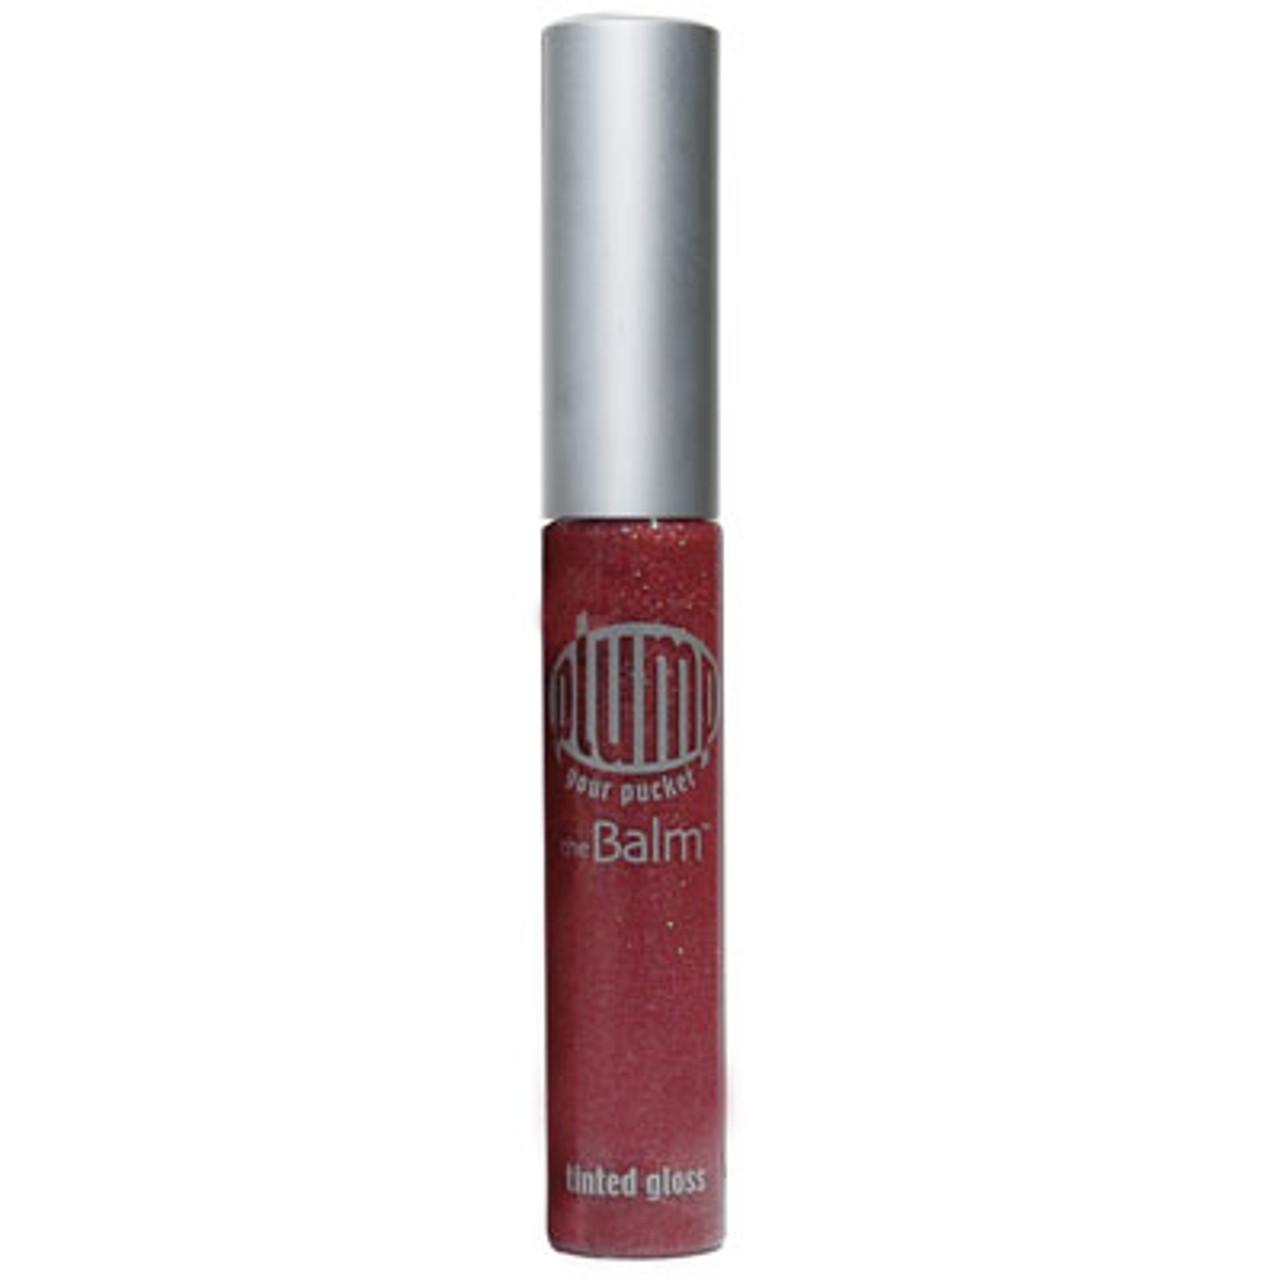 theBalm Plump Your Pucker Tinted Gloss BeautifiedYou.com